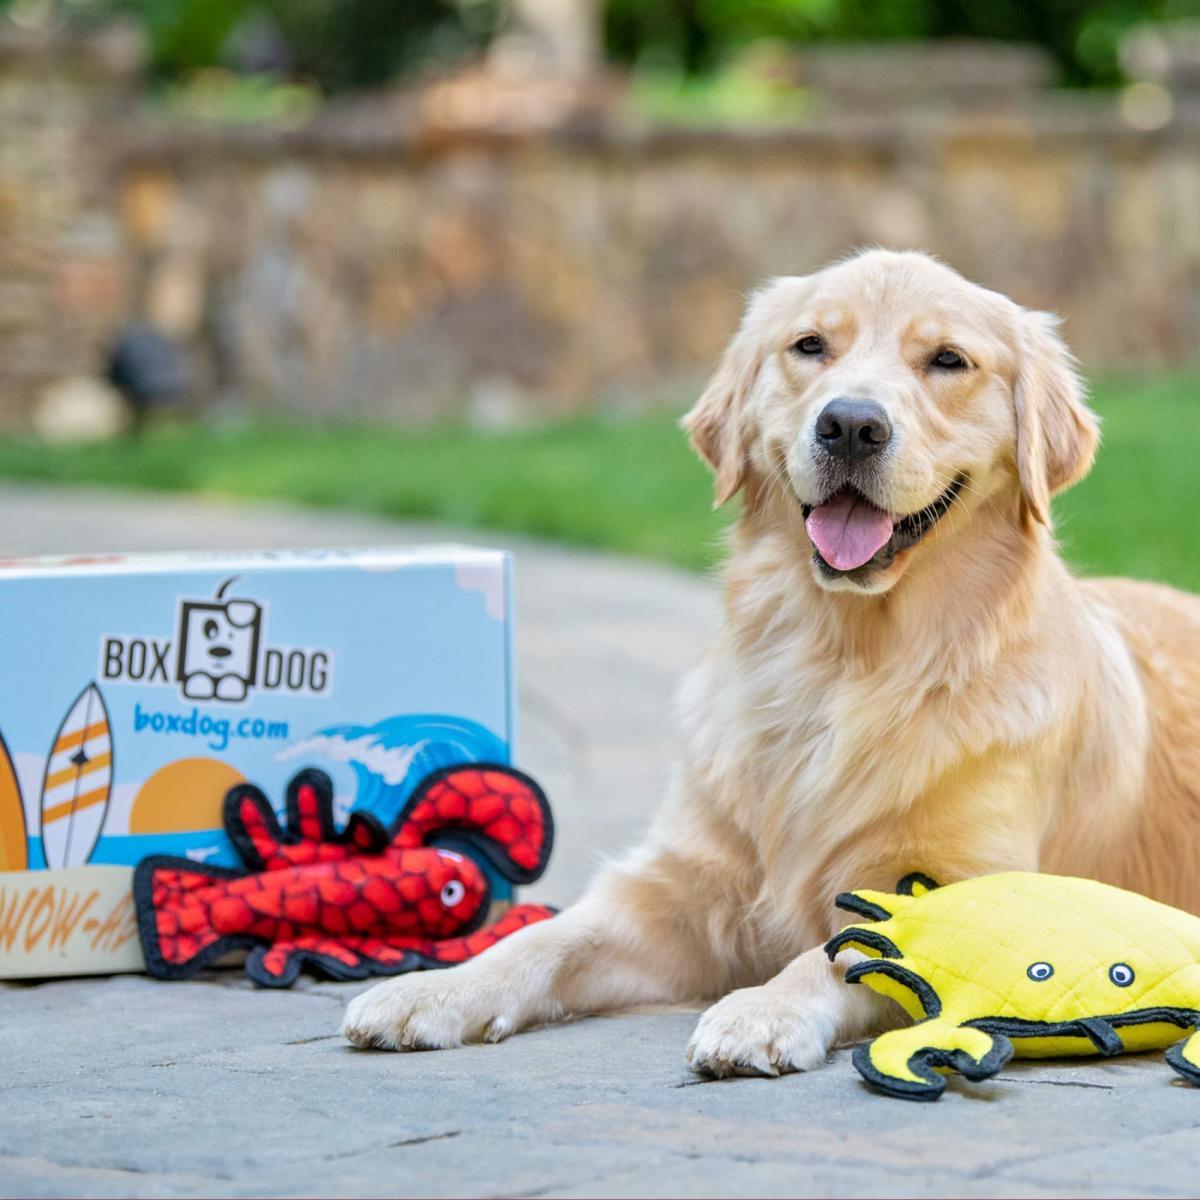 BoxDog 4 Giant Seasonal Dog Boxes per Year